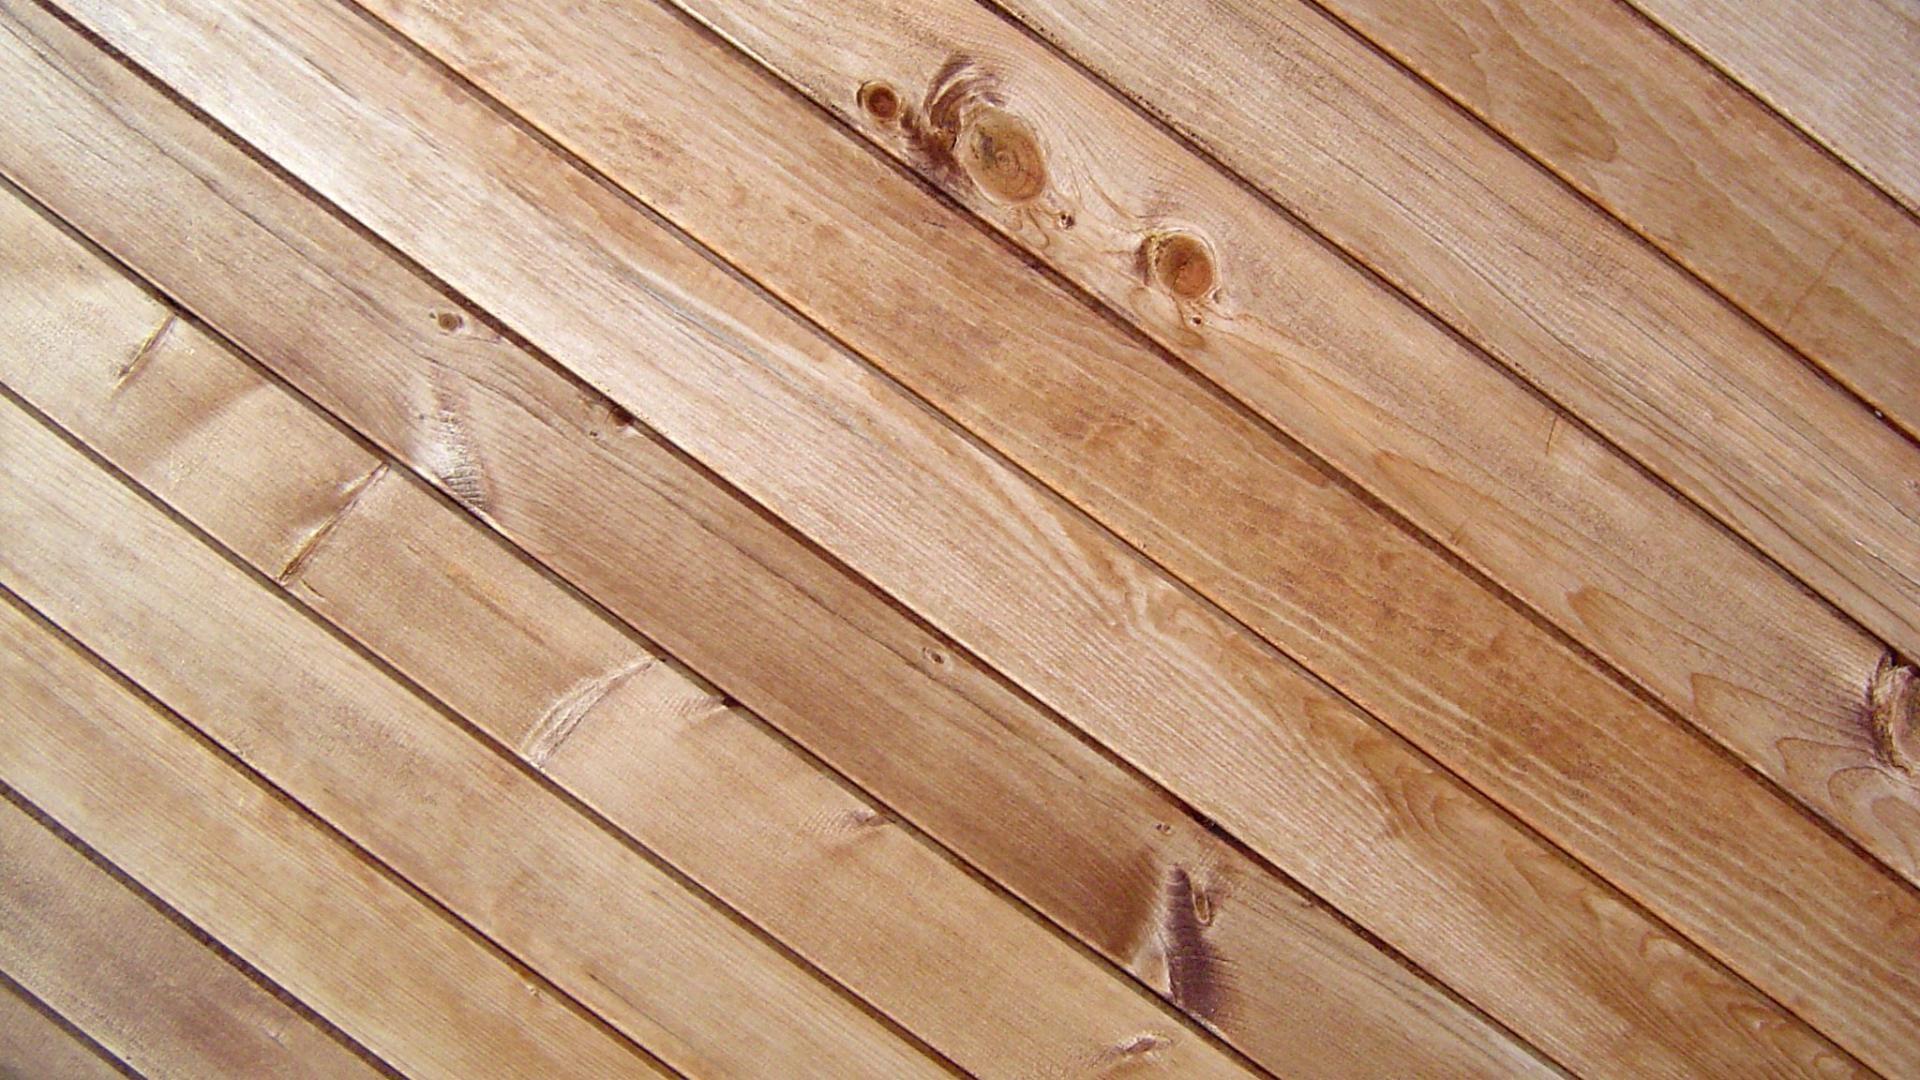 HD Wood Background ·â'